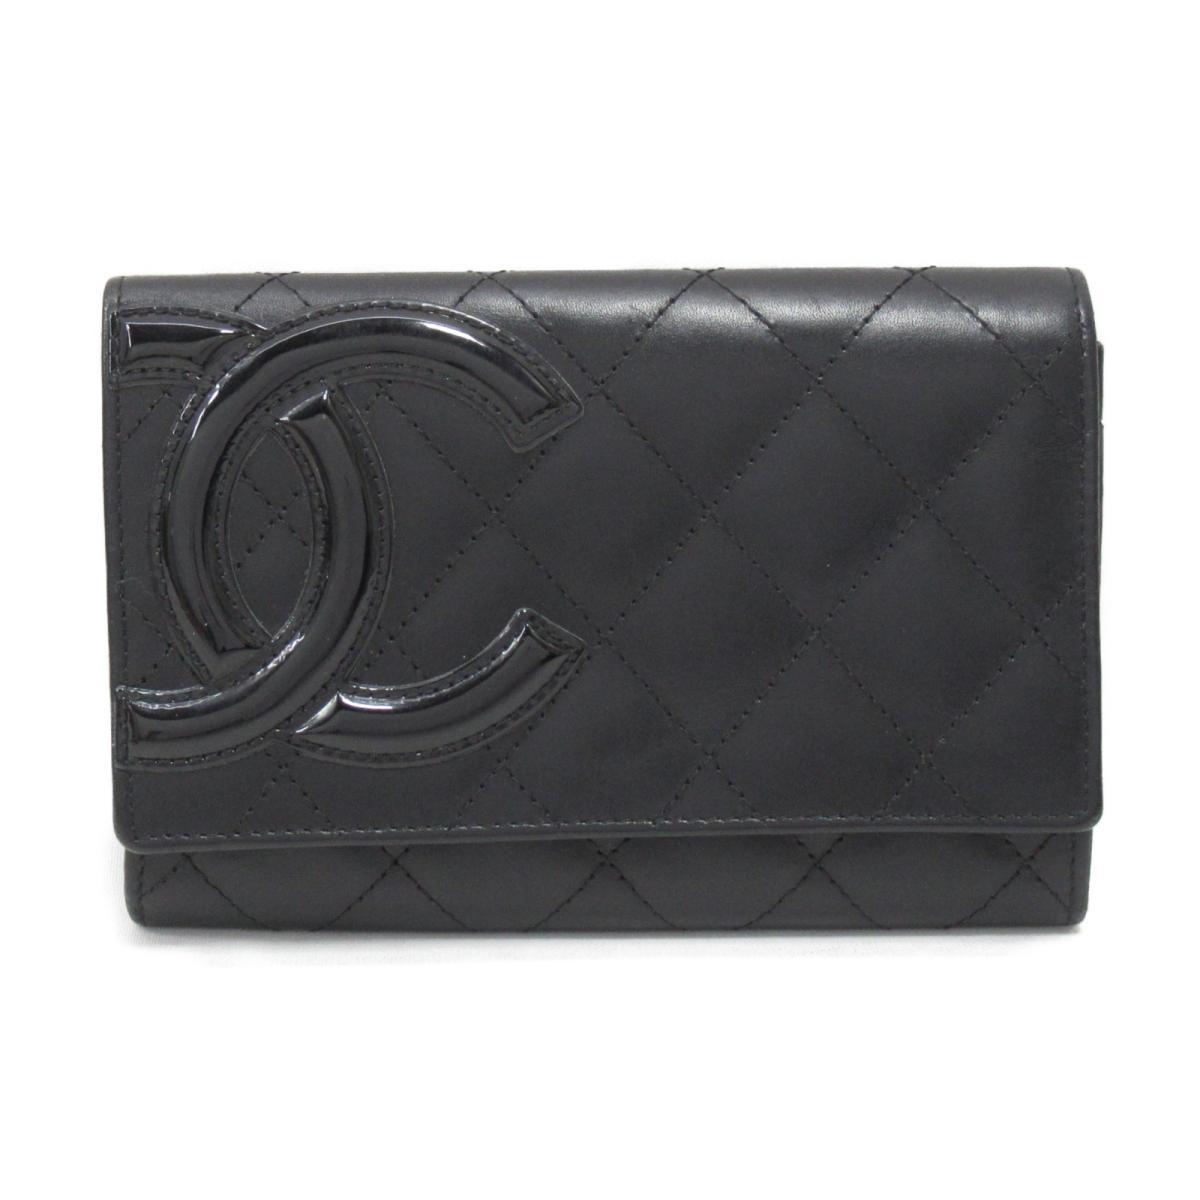 ZIP財布/レディース/可愛い/おしゃれ 財布